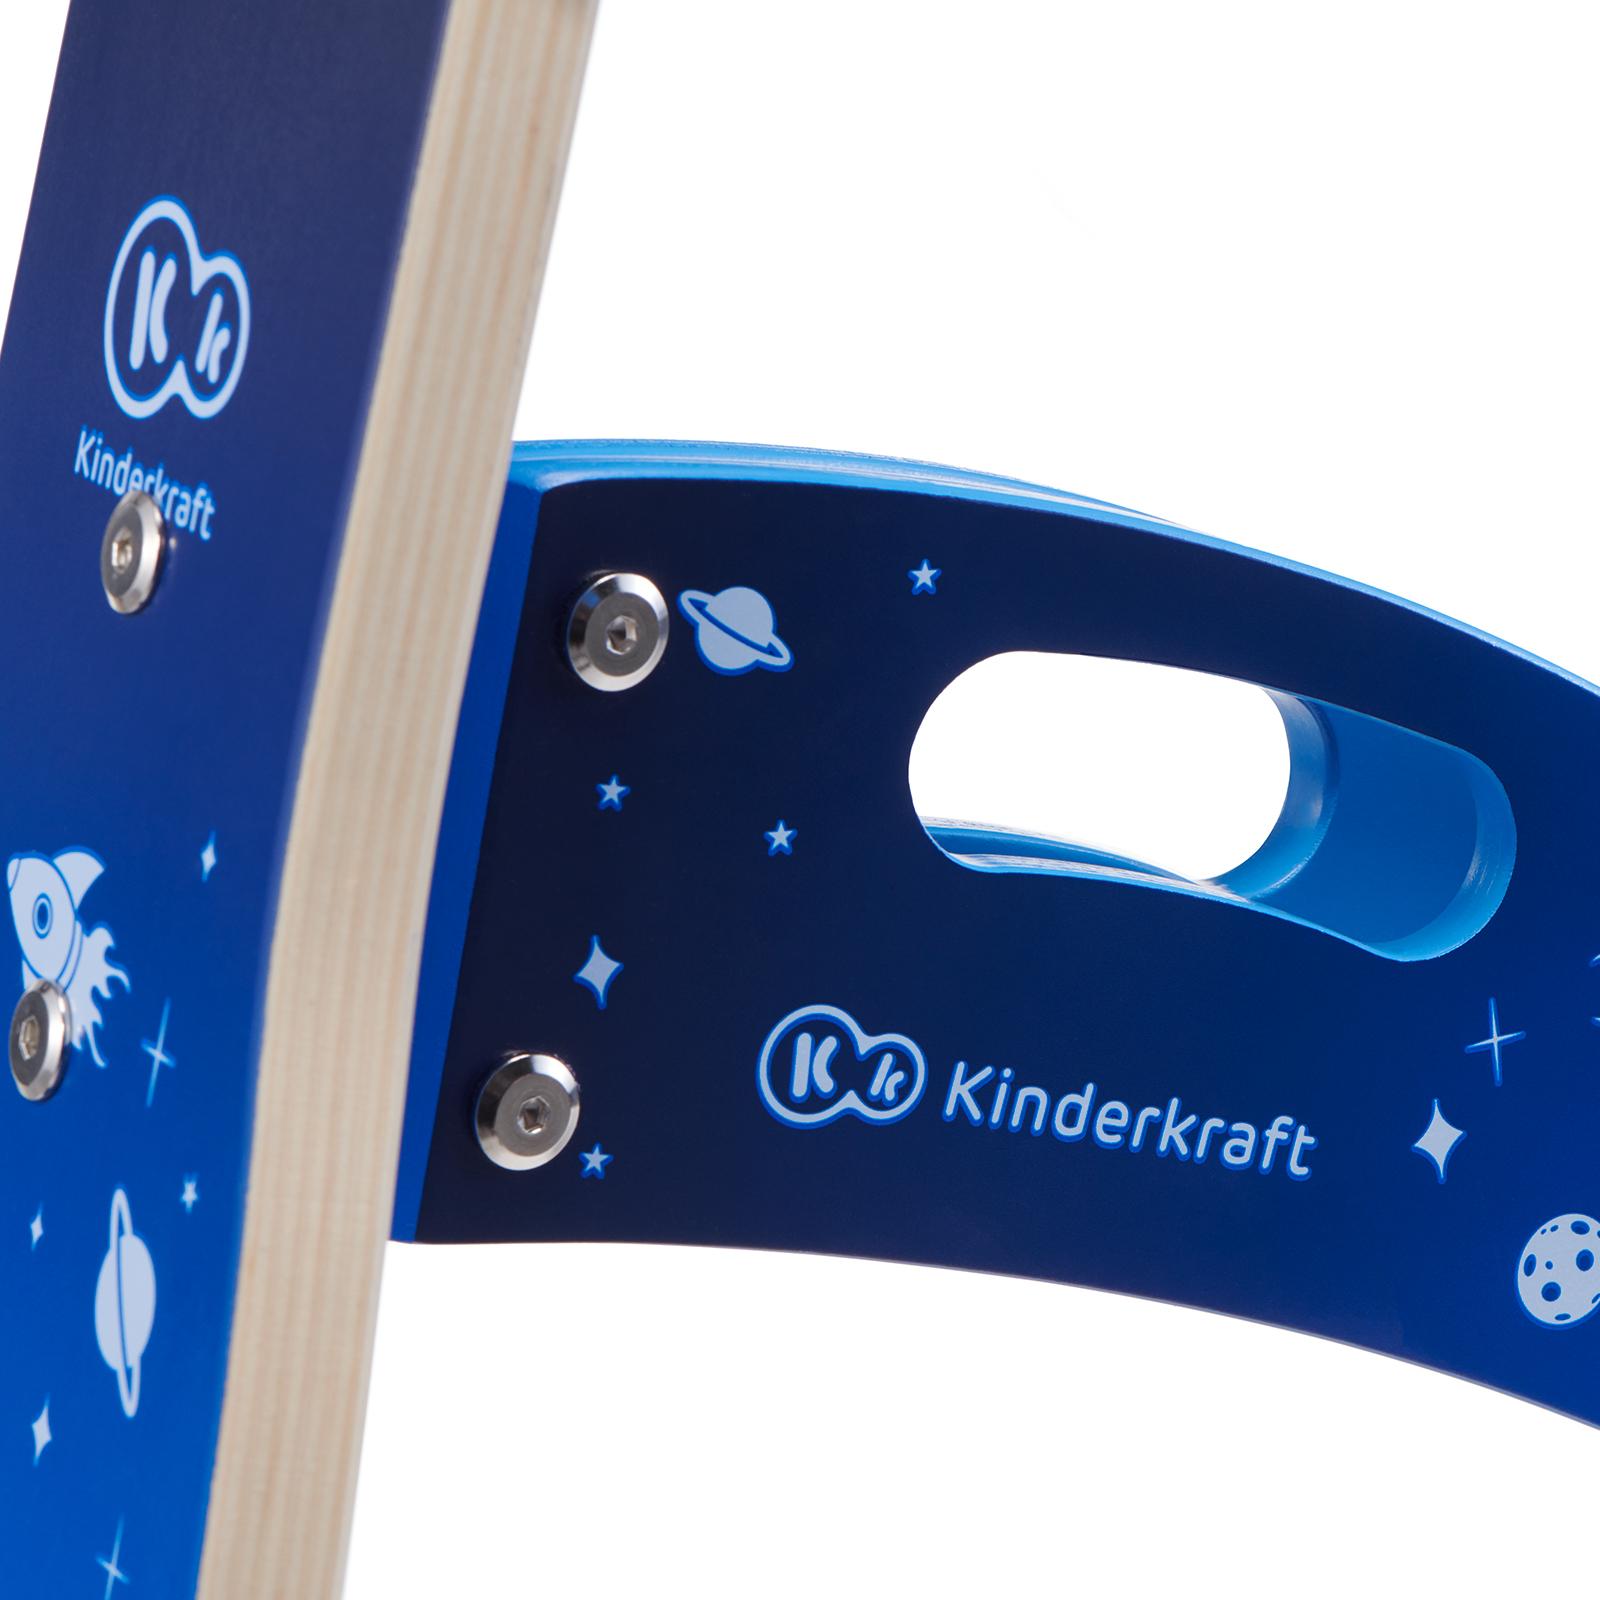 Balans bicikl guralica Kinderkraft GALAXY blue bicikl bez pedala, ručka